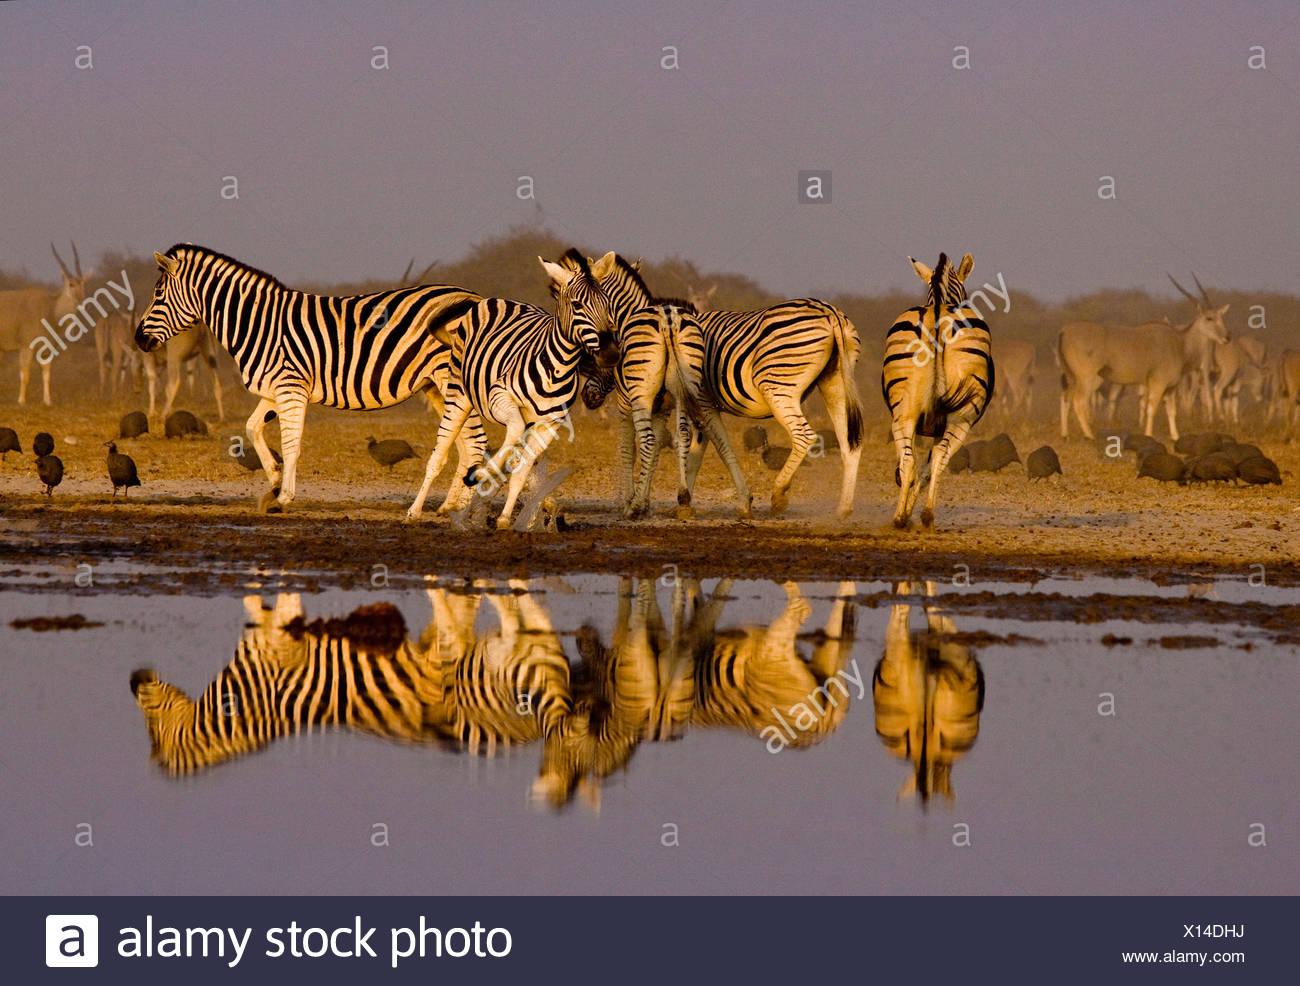 Les zèbres reflète au waterhole, Etosha National Park, Namibie. Photo Stock